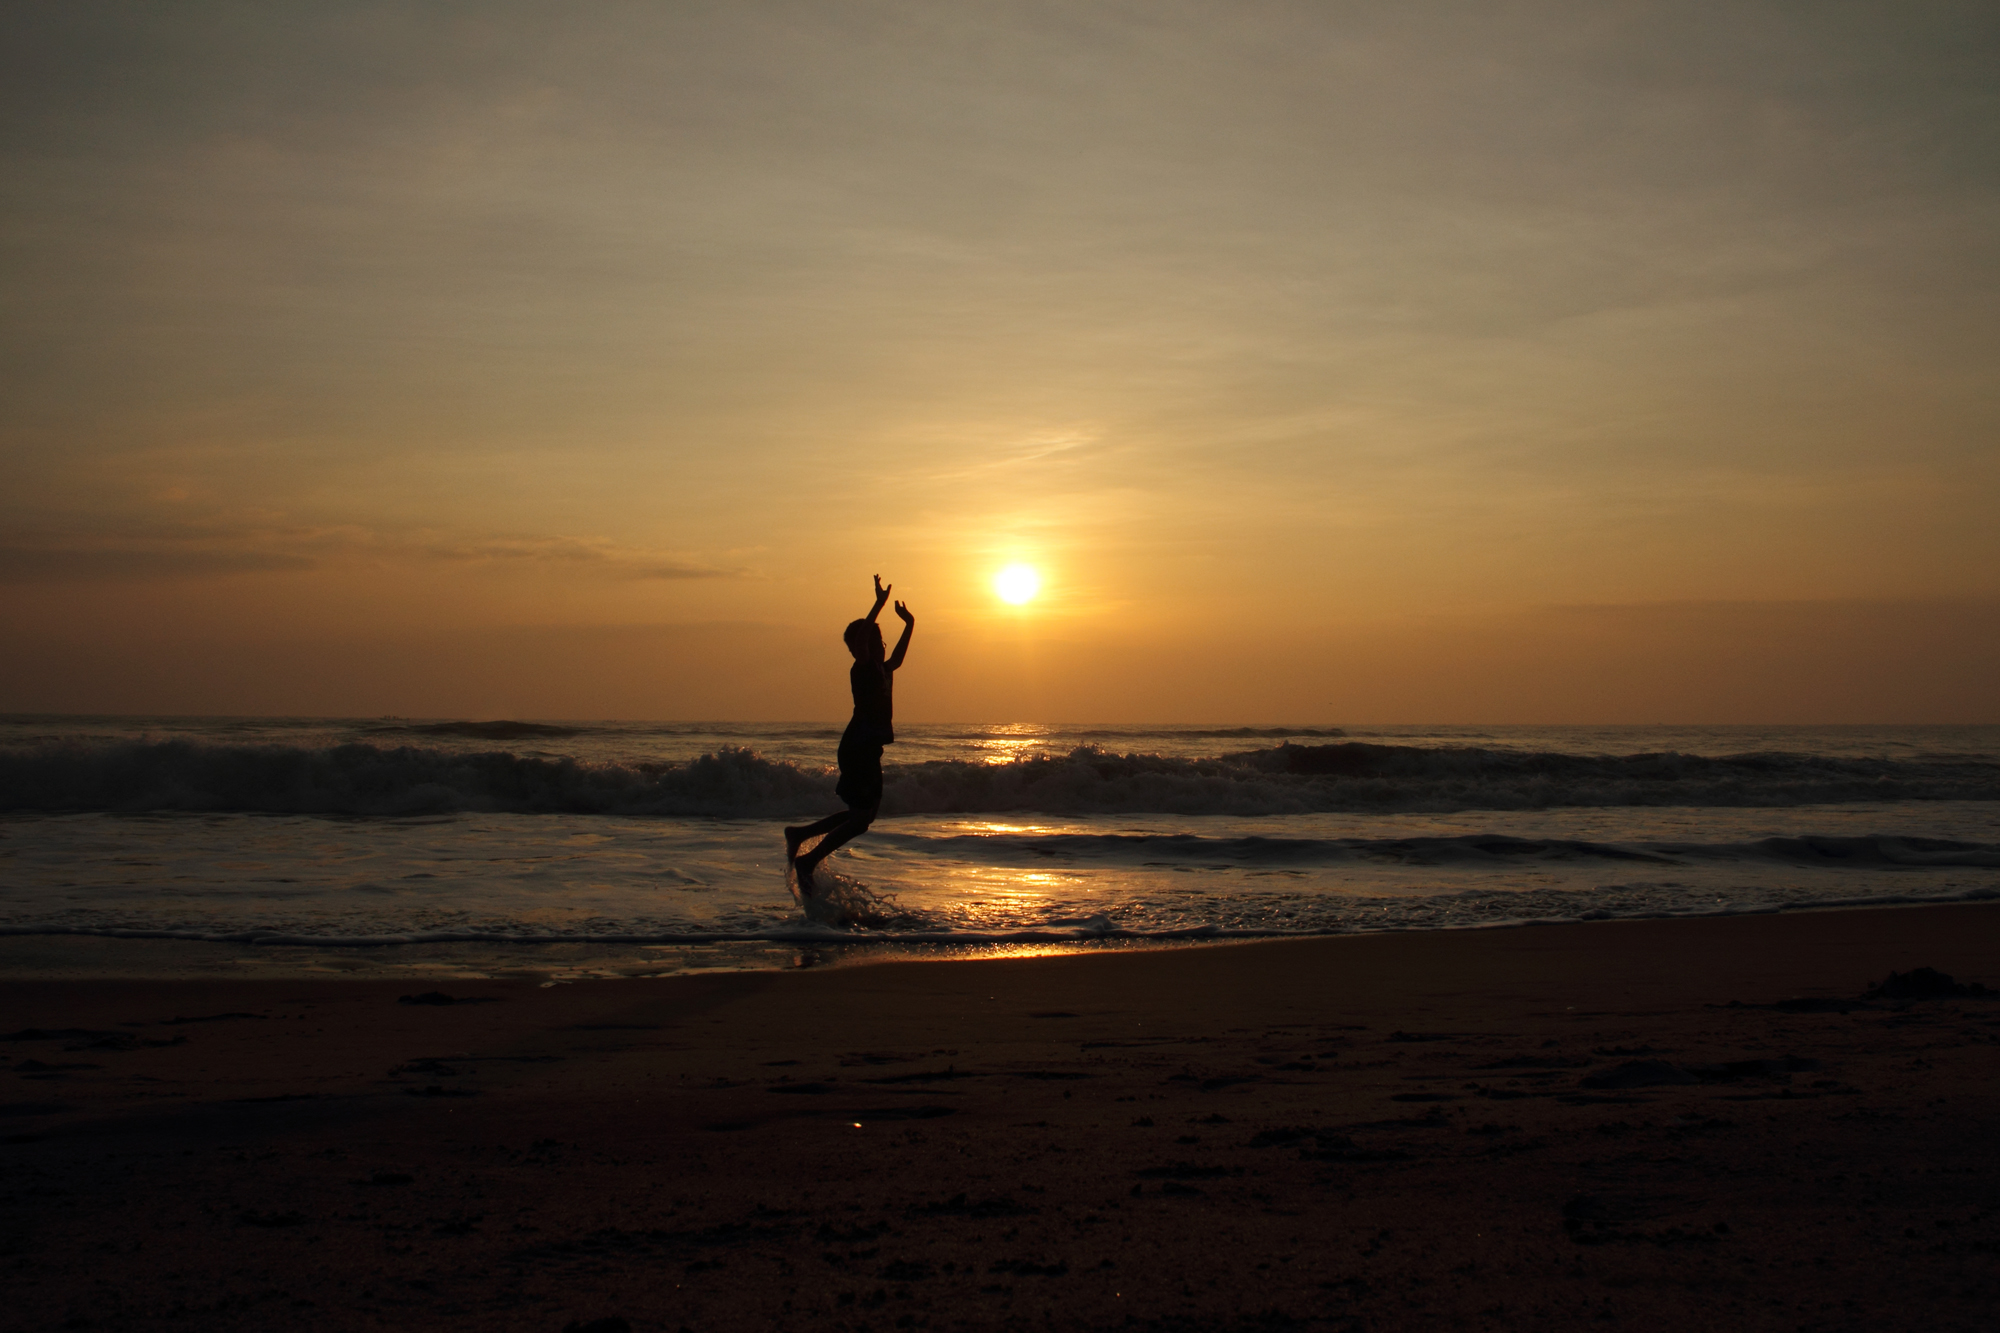 My son Anirudh playing on the Pondicherry beach.